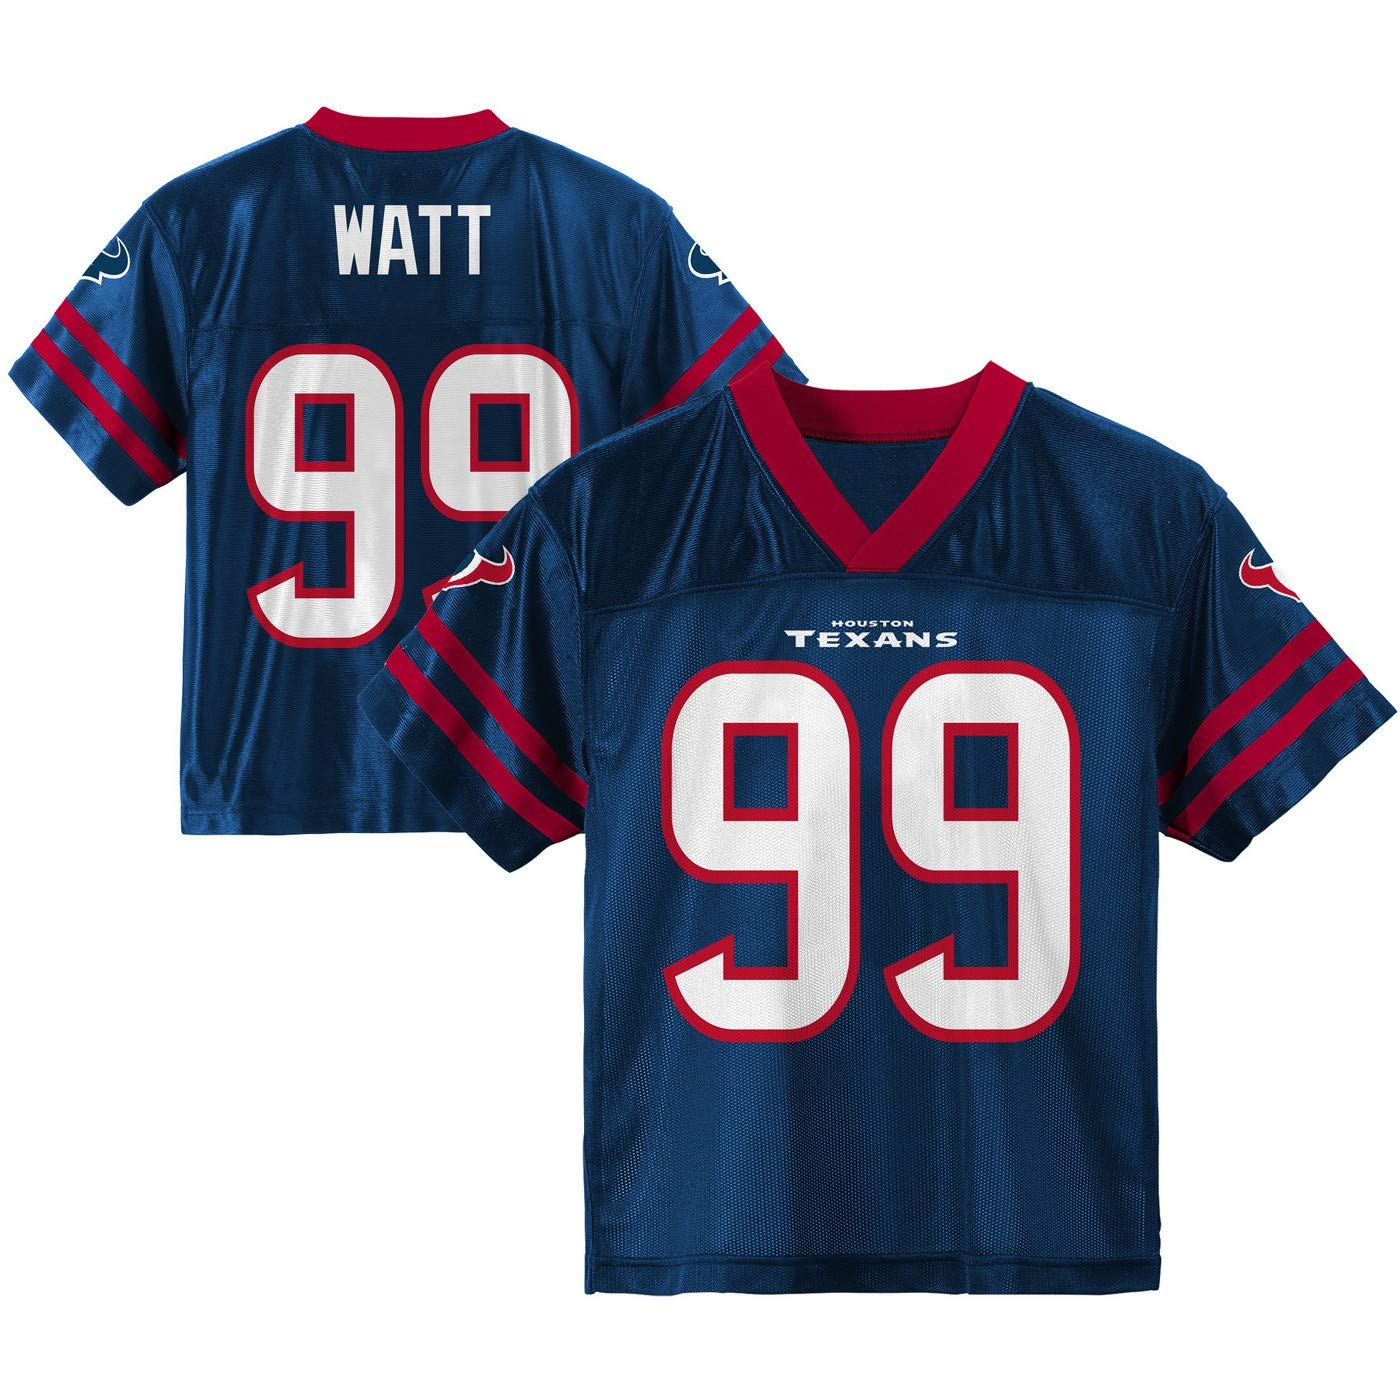 Watt Houston Texans #99 Navy Blue Youth Home Player Jersey J.J